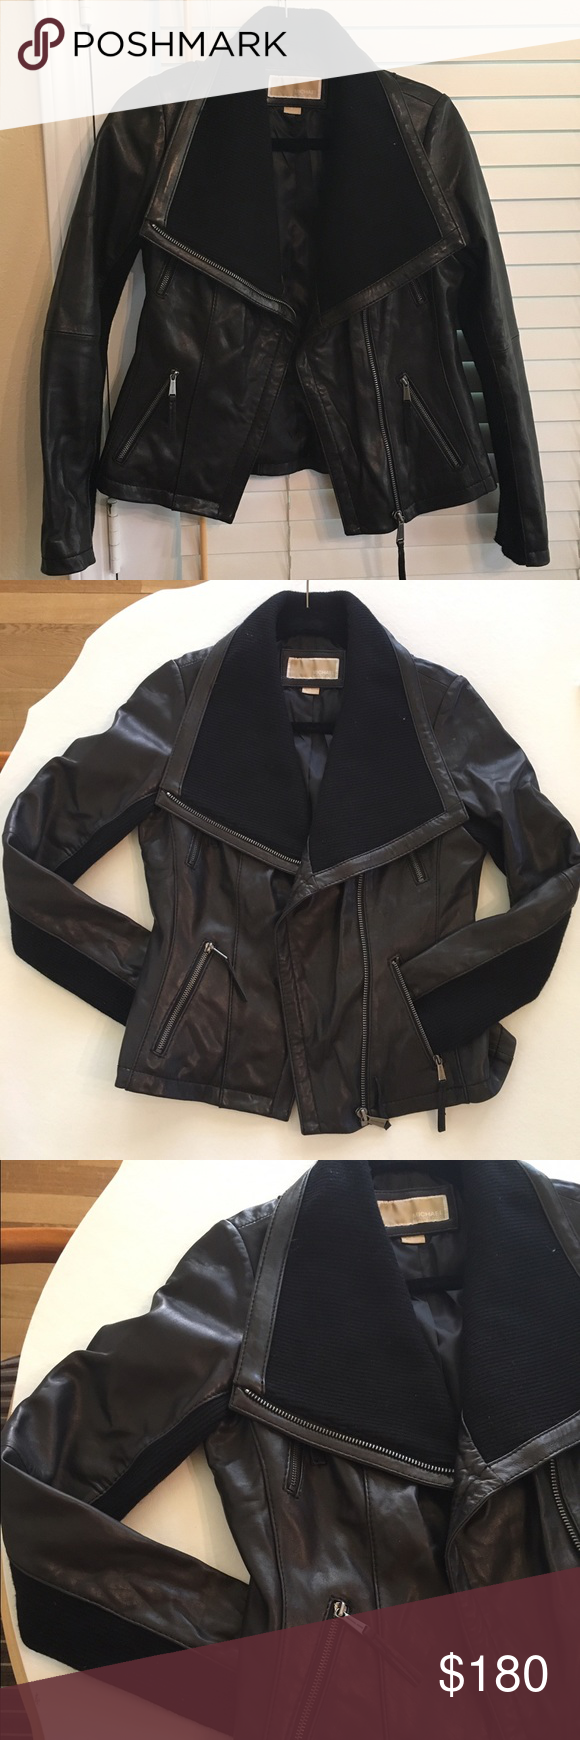 Michael Kors leather jacket Michael Kors leather jacket. Excellent condition (worn twice) Michael Kors Jackets & Coats